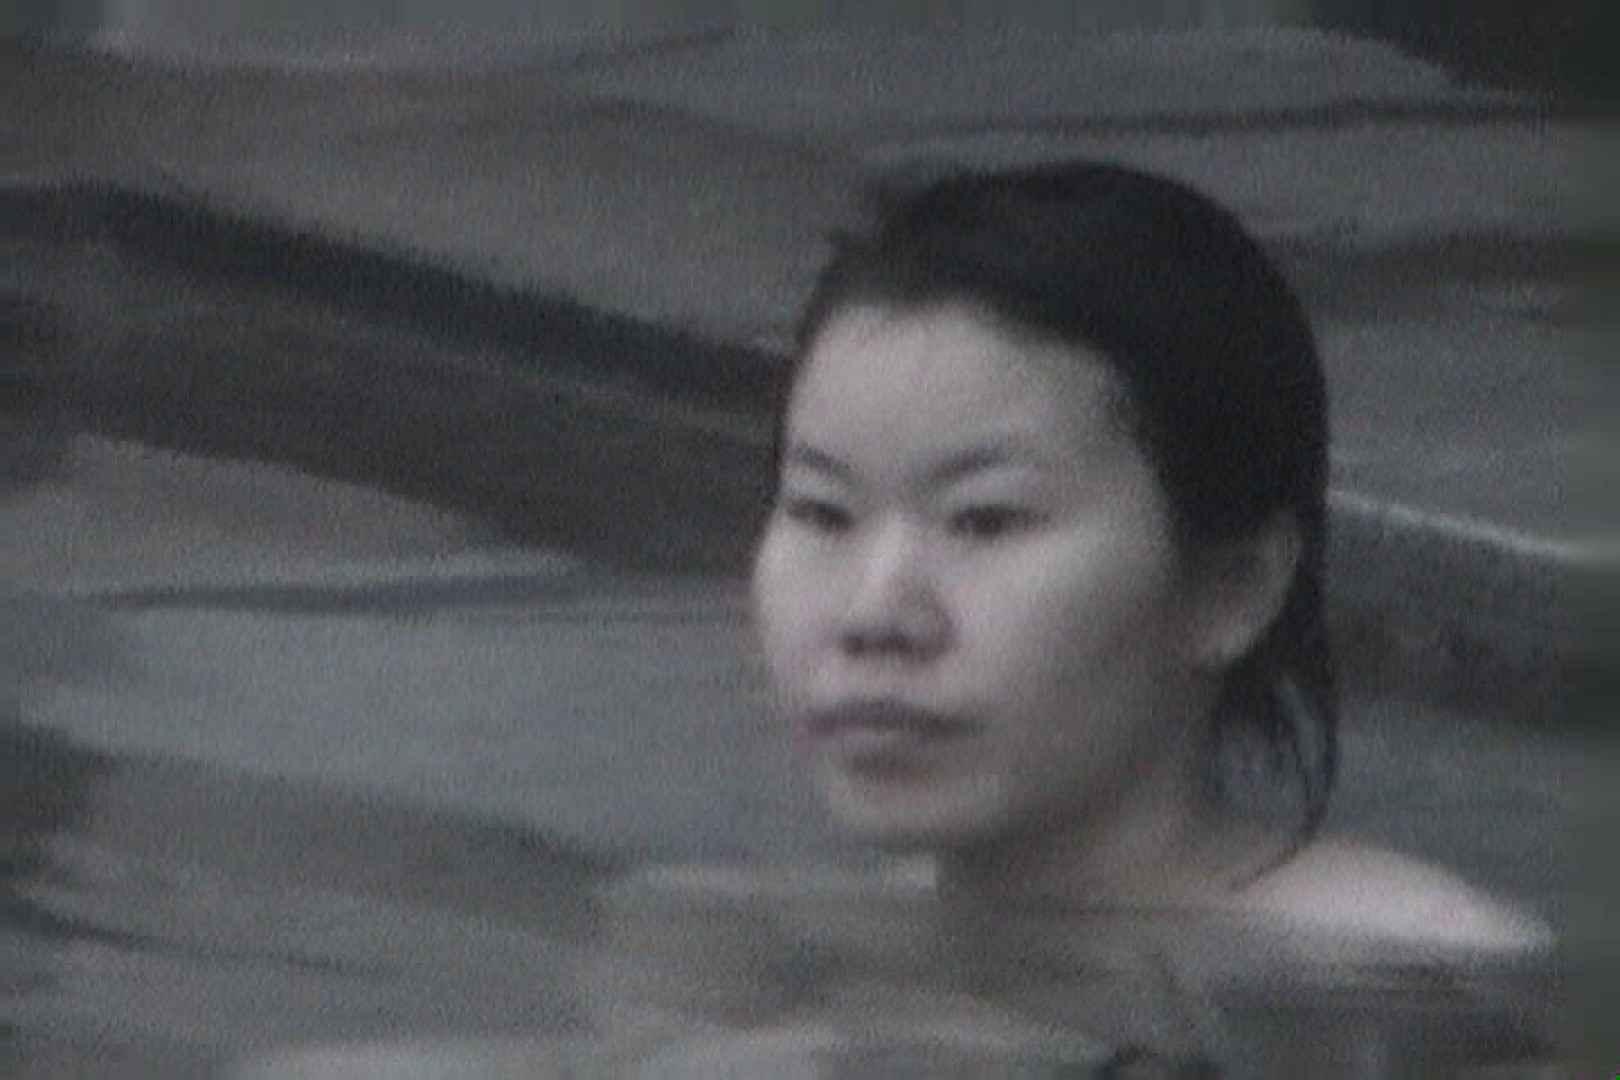 Aquaな露天風呂Vol.556 美しいOLの裸体 すけべAV動画紹介 69pic 8